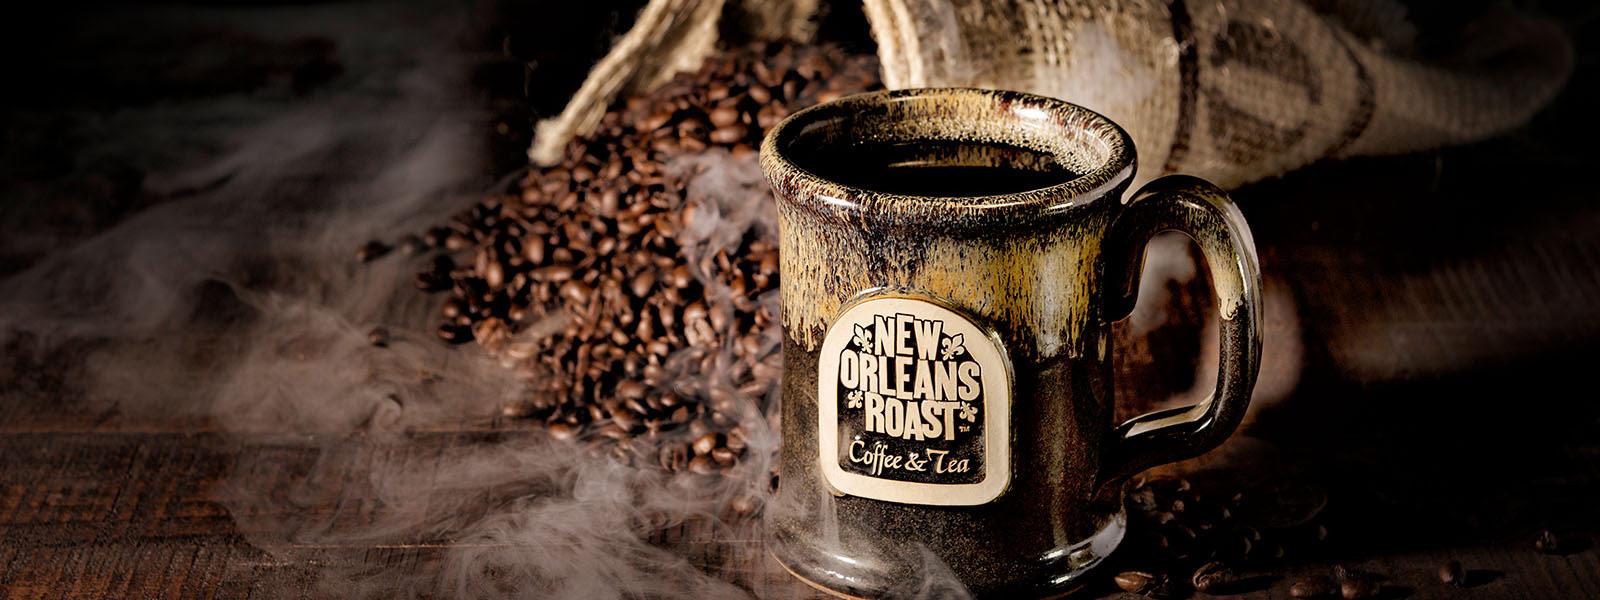 Image Representing Coffee Club